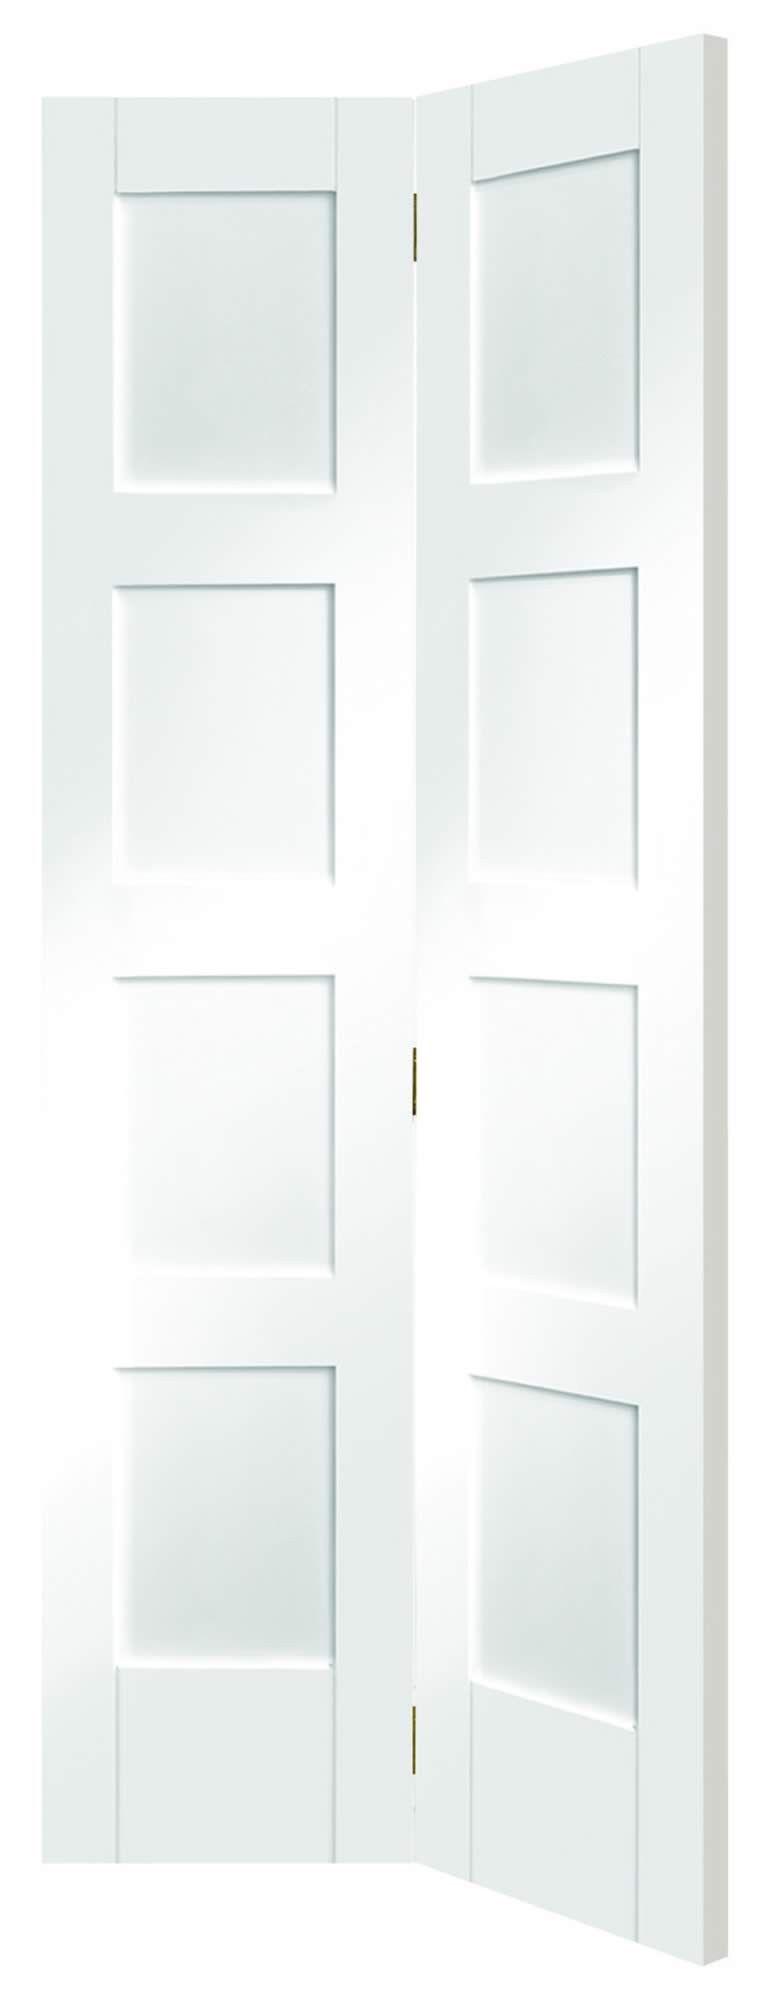 Shaker 4 Panel White Pre Primed Clear Glazed Bi Fold Internal Doors Extension Kitchen